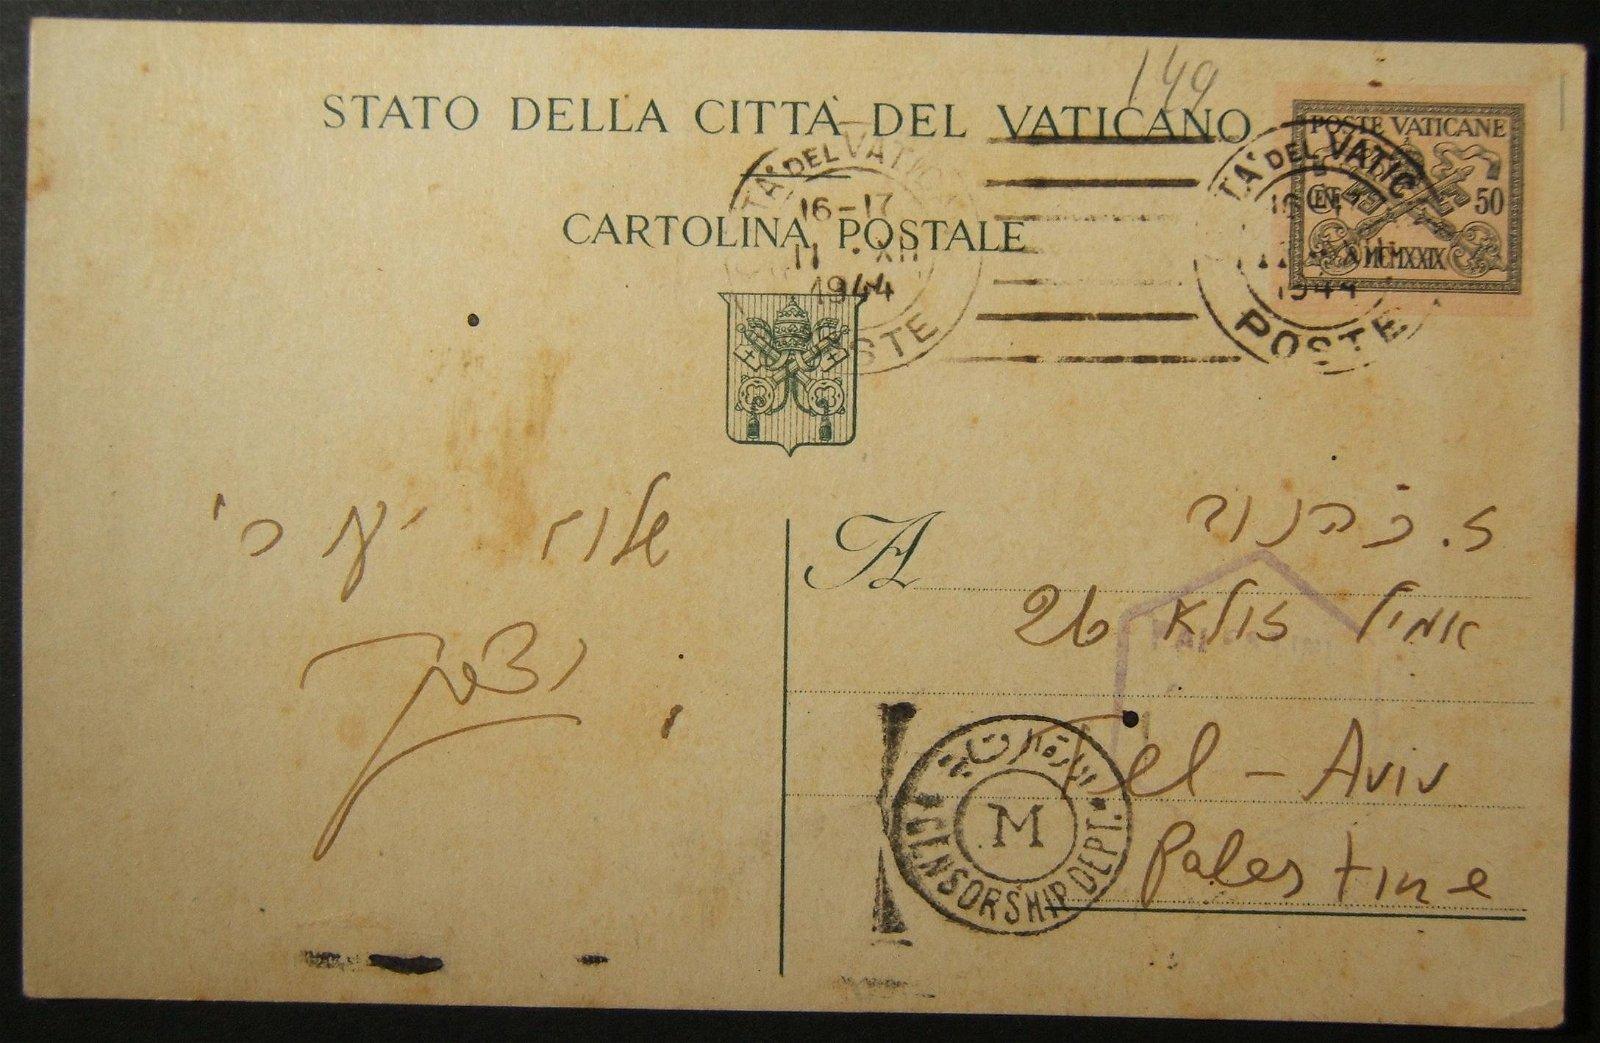 12/1944 WWII censored cv ex Jewish soldier at VATICAN